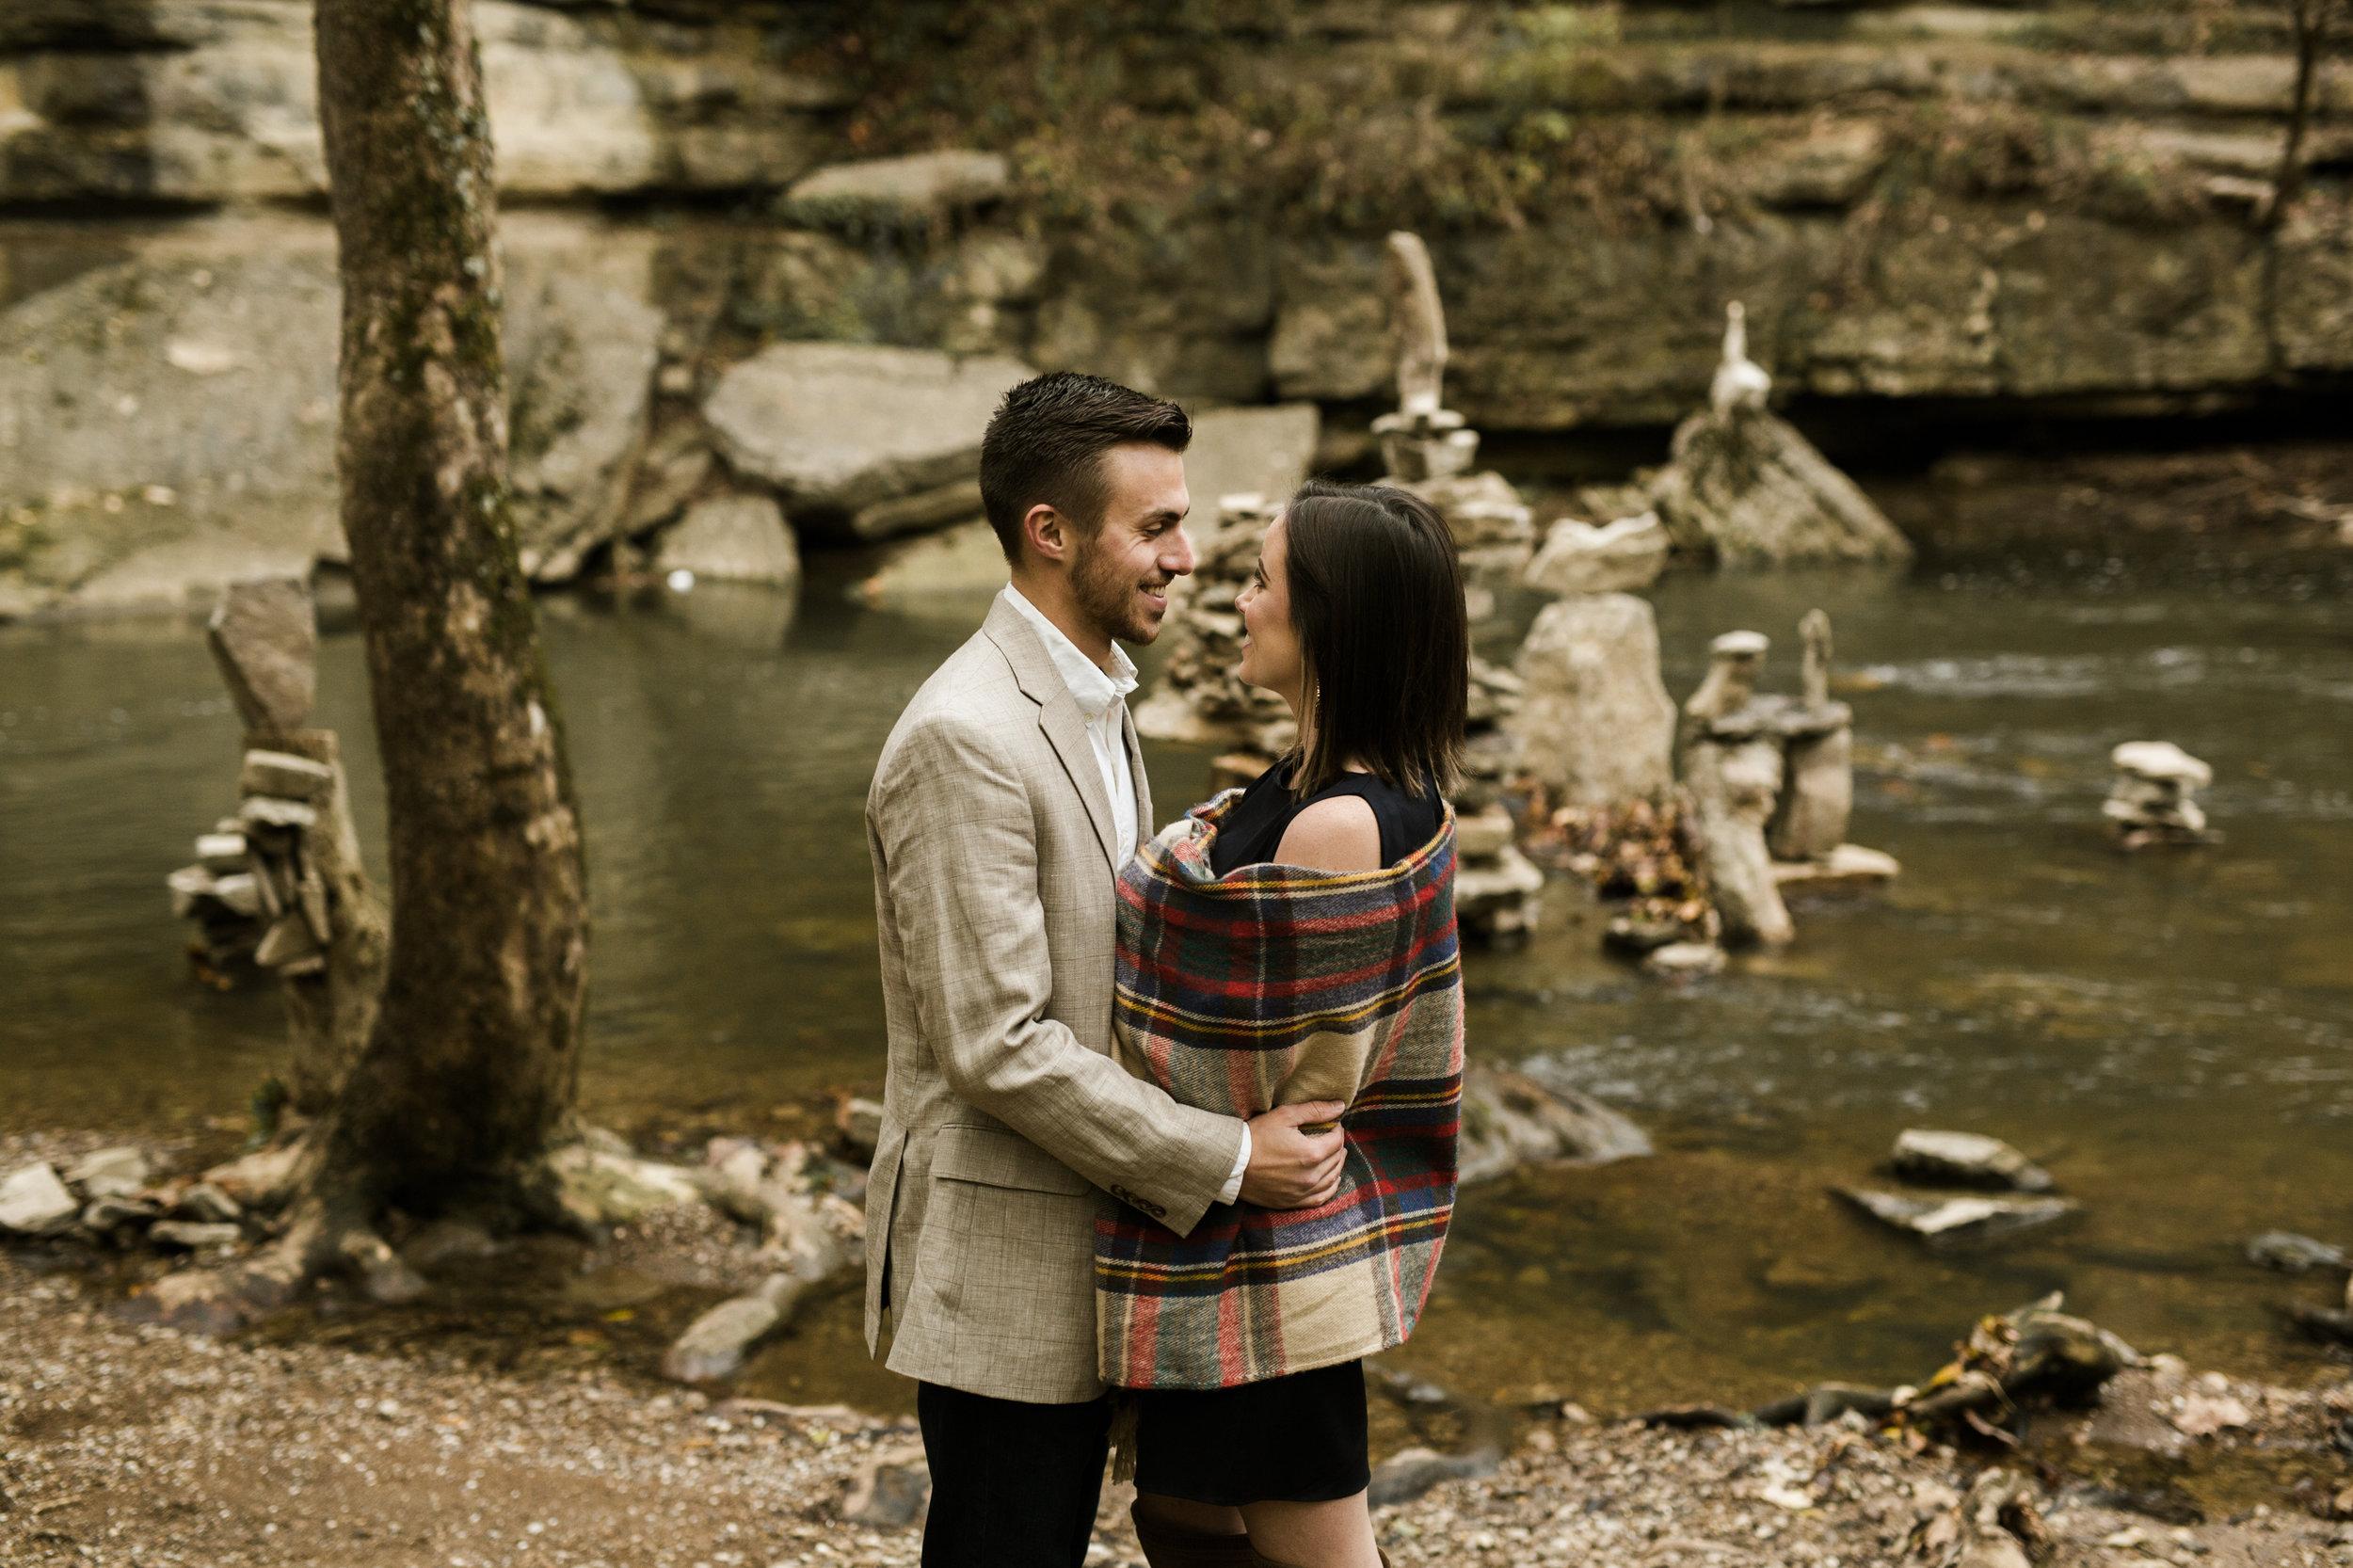 Kelsey and Daniel Engagement 2018 Crystal Ludwick Photo Louisville Wedding Photographer Kentucky Wedding Photographer (30 of 31).jpg